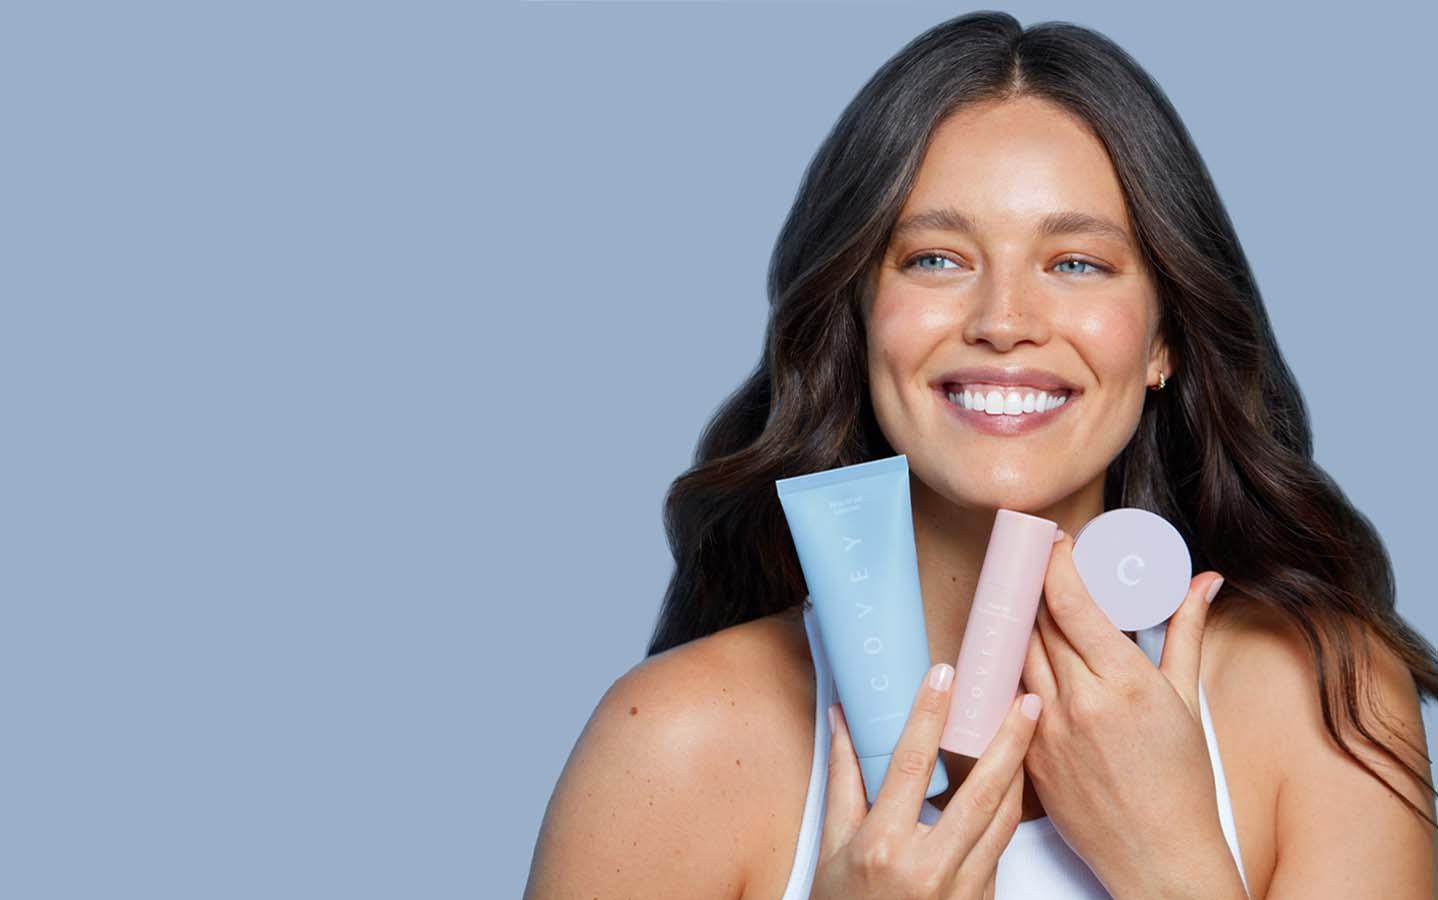 Emily DiDonato holding skincare products